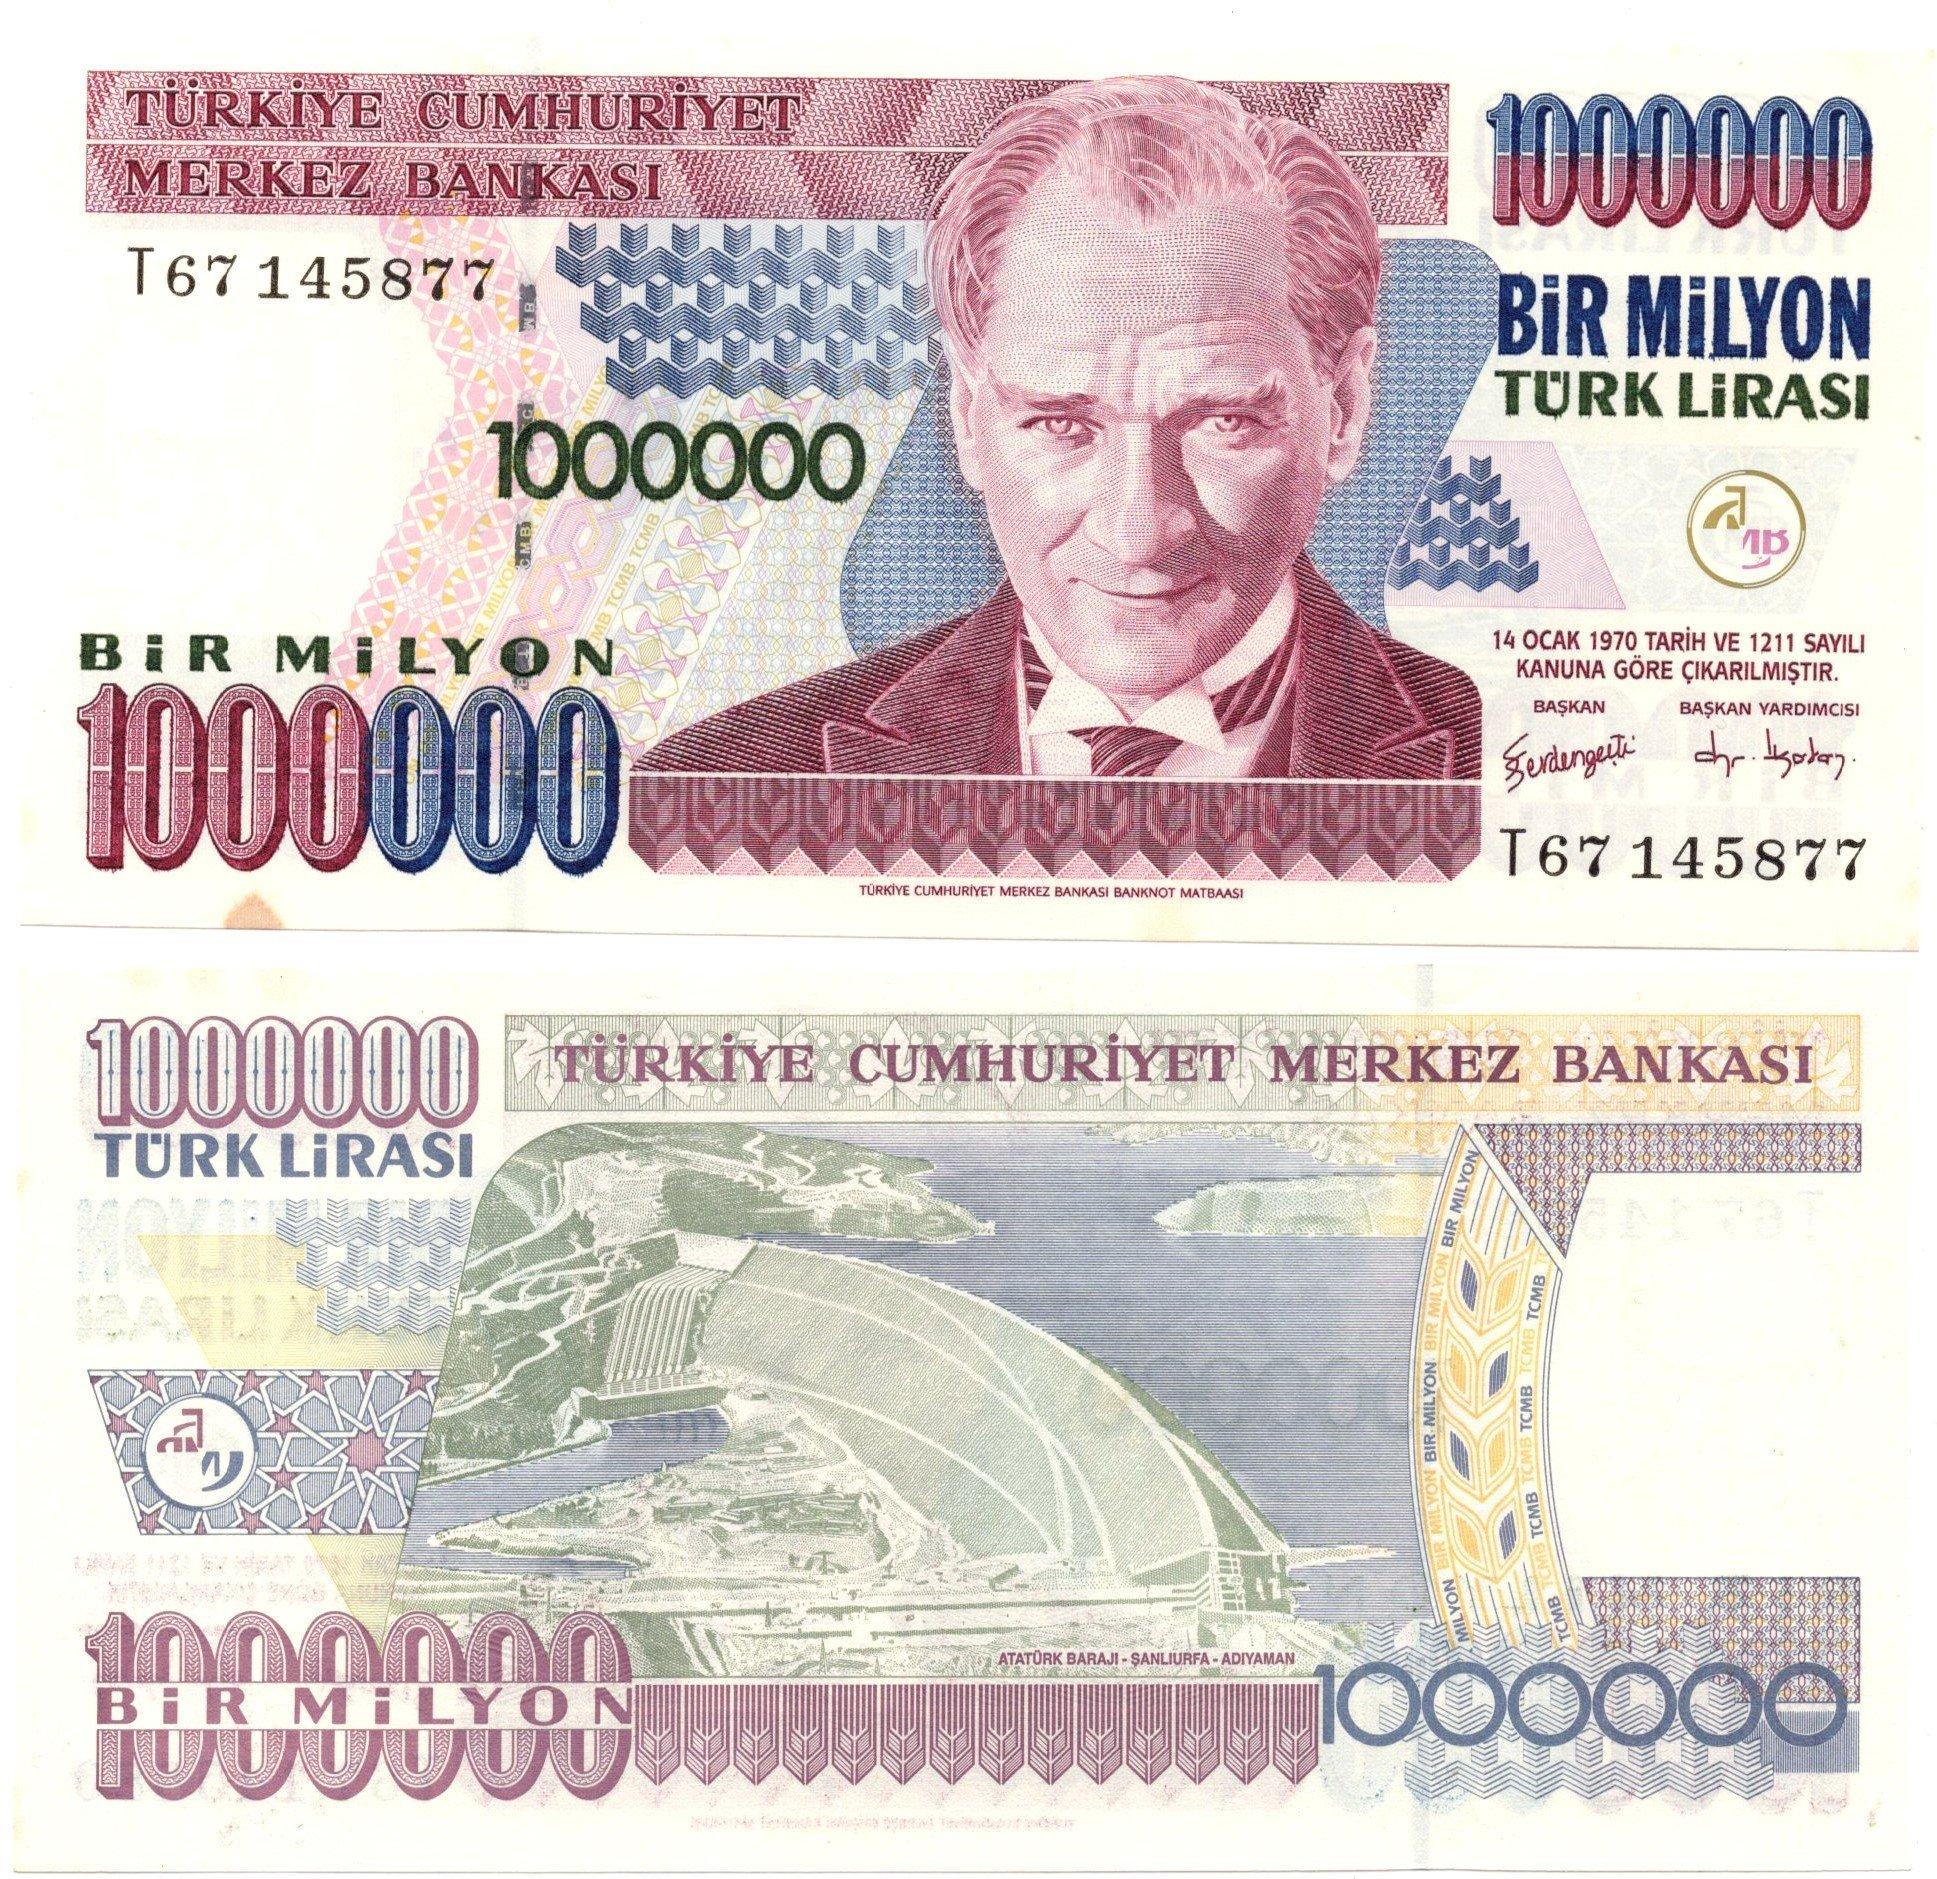 turkey 1000000 lirasi banknote